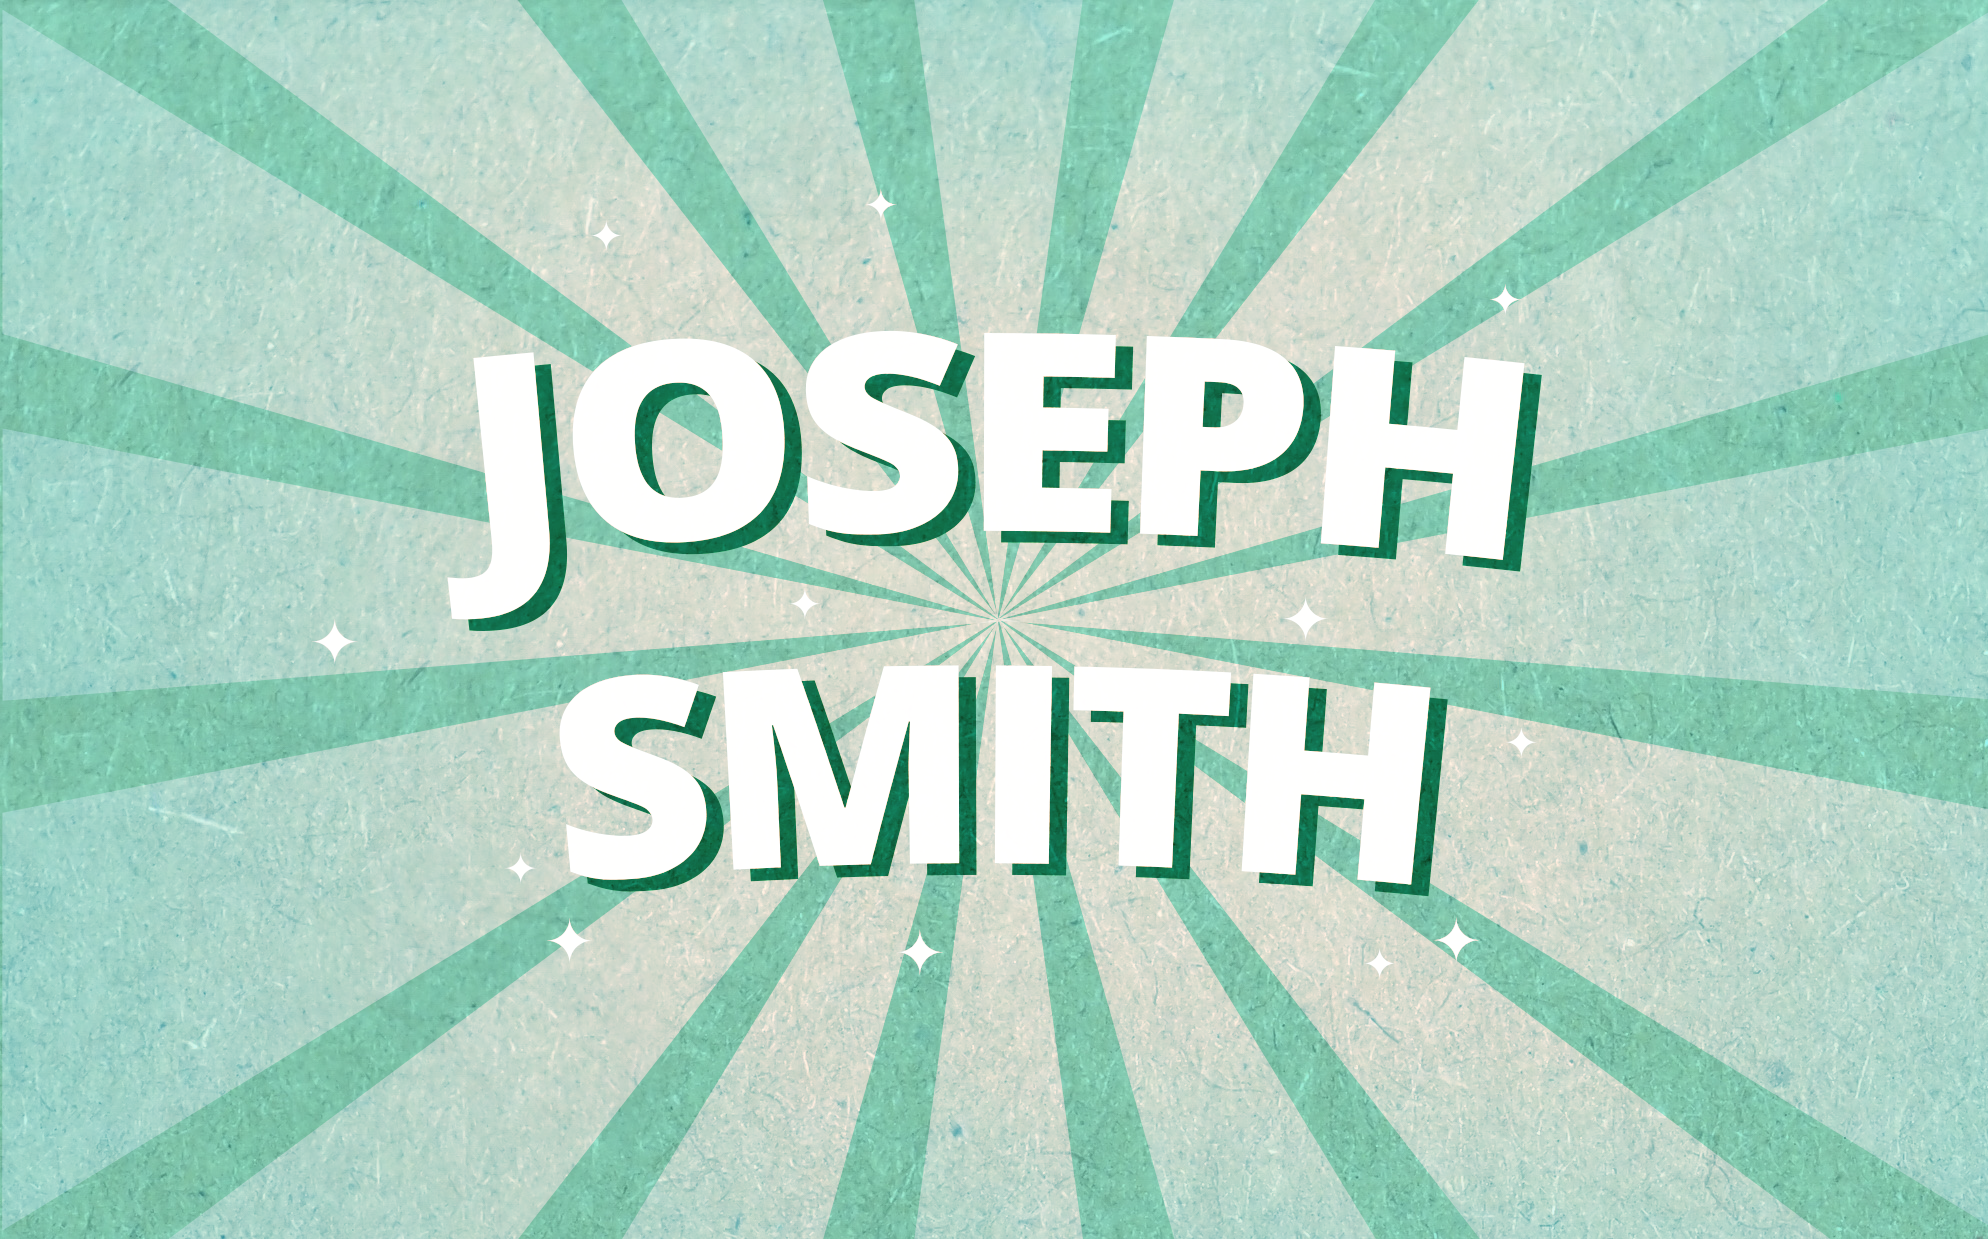 whoisit_josephsmith